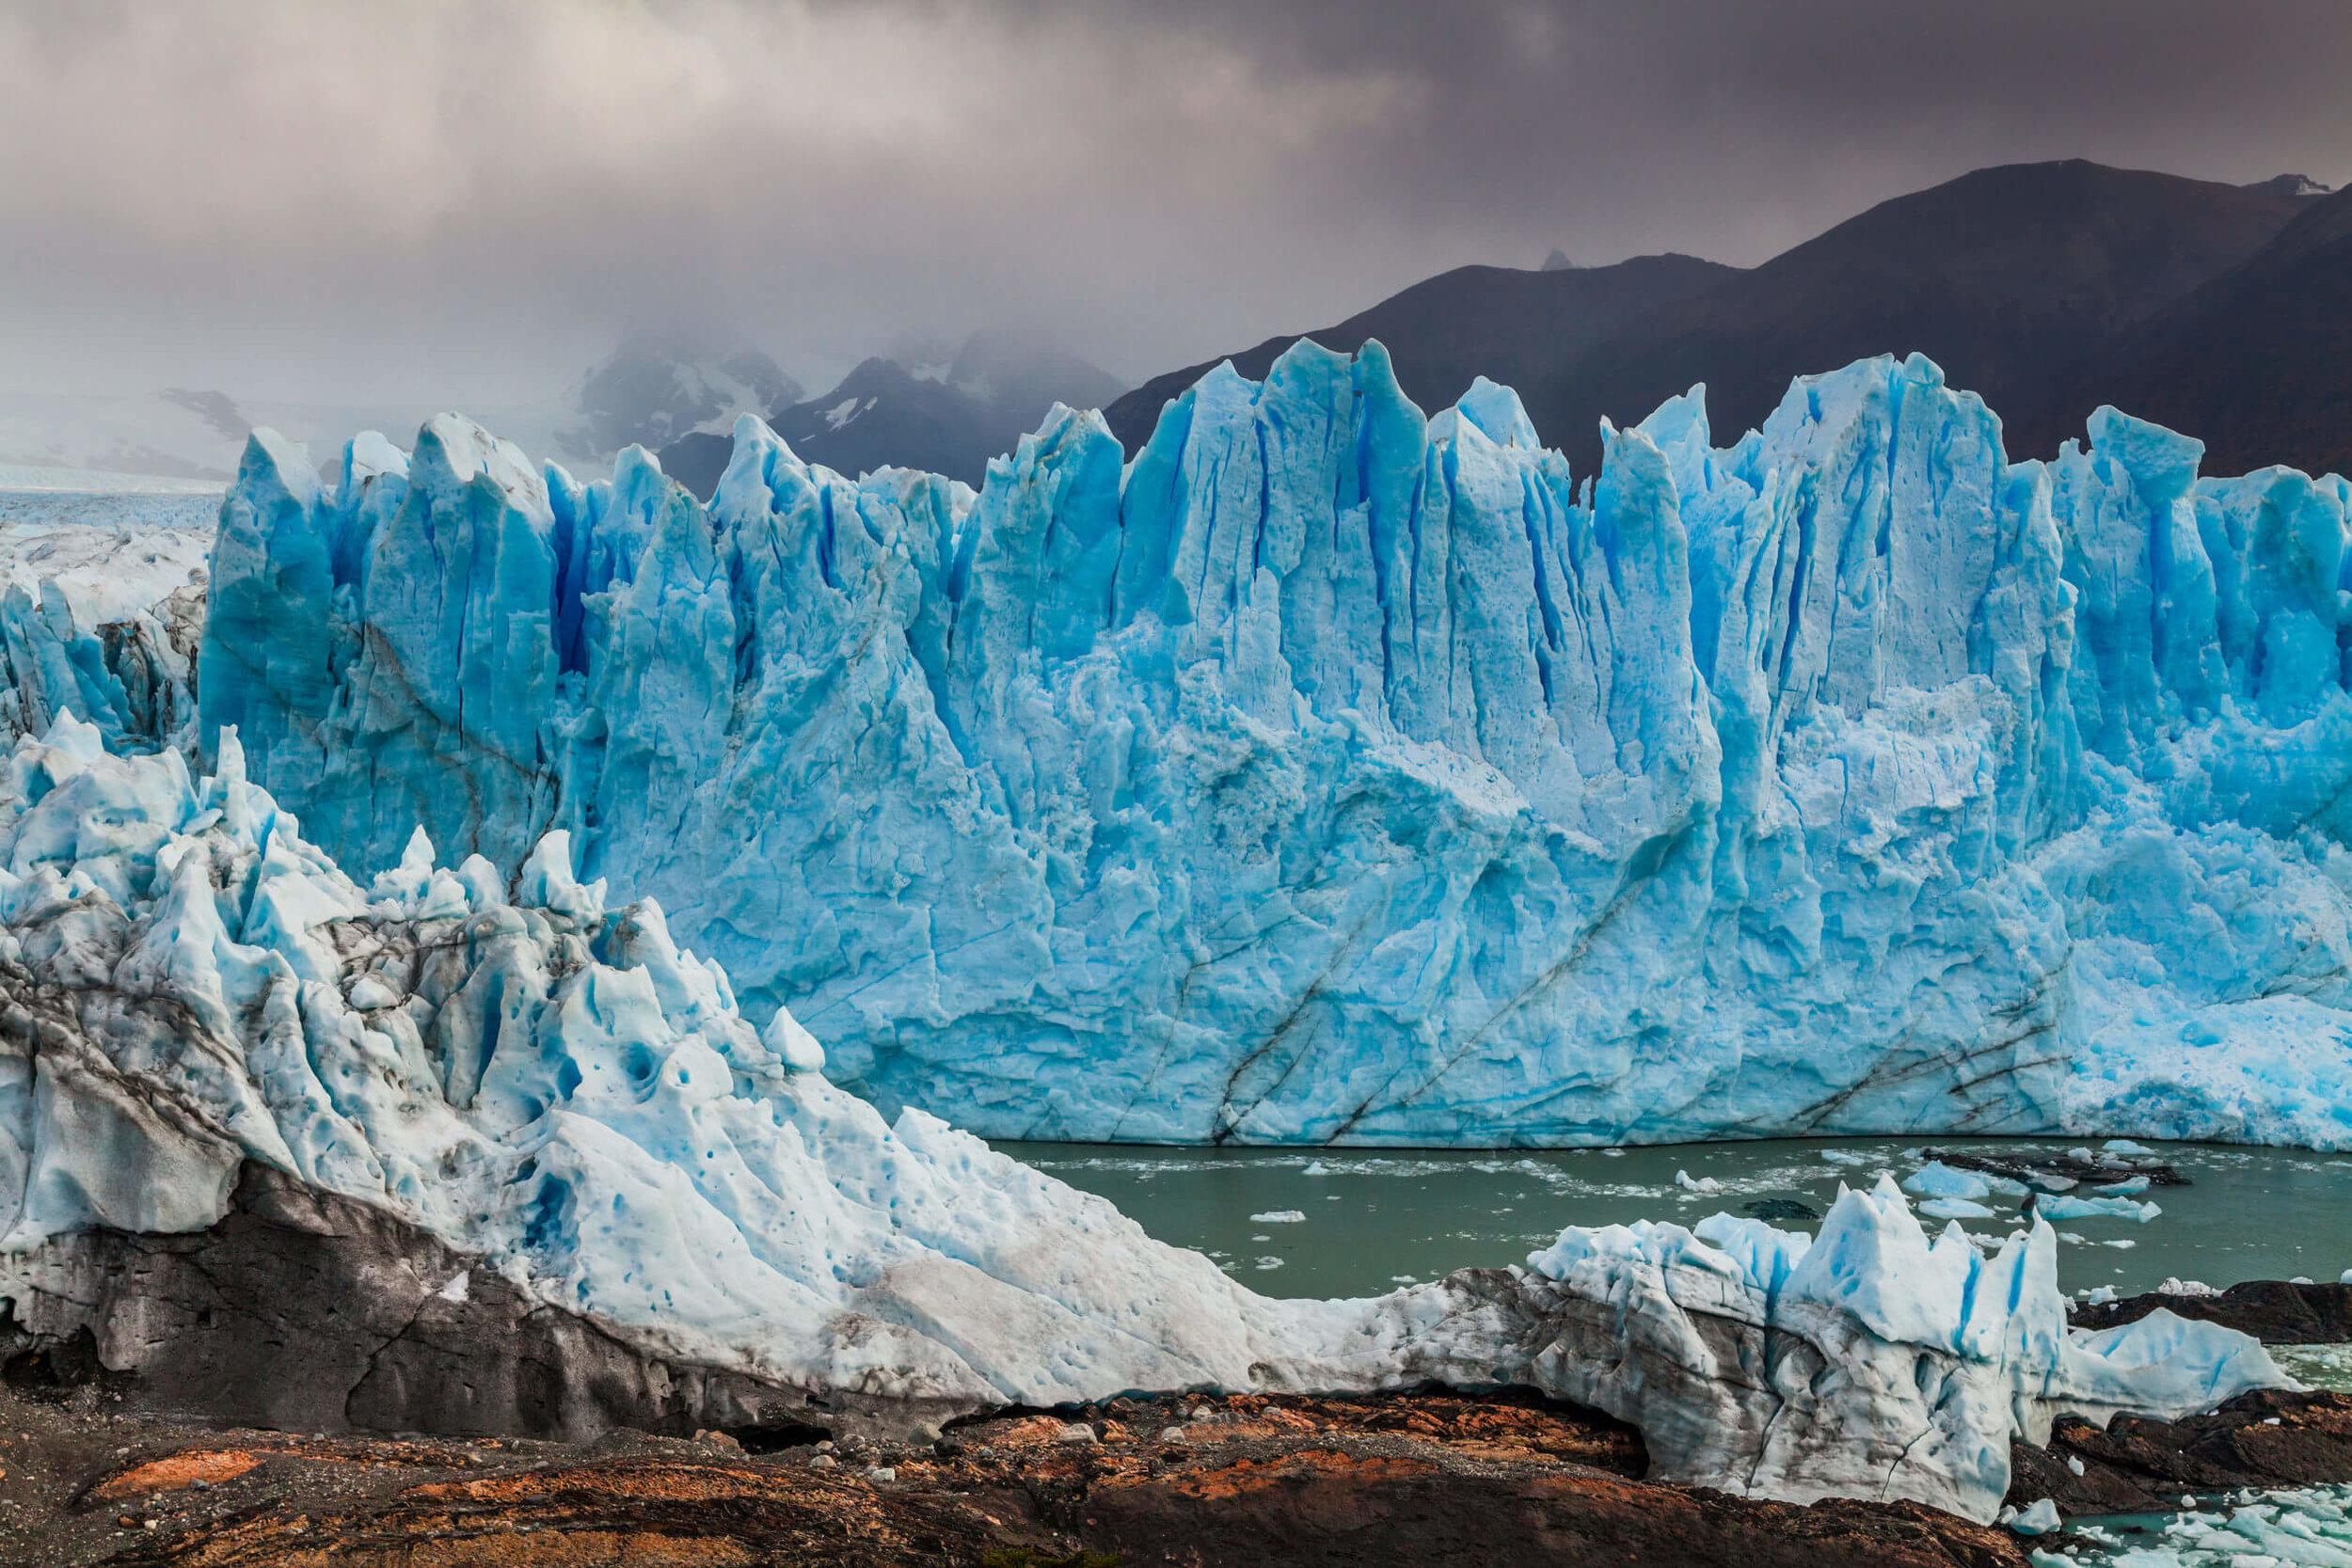 Perito Moreno Glacier | Anton Petrus © 123RF.com